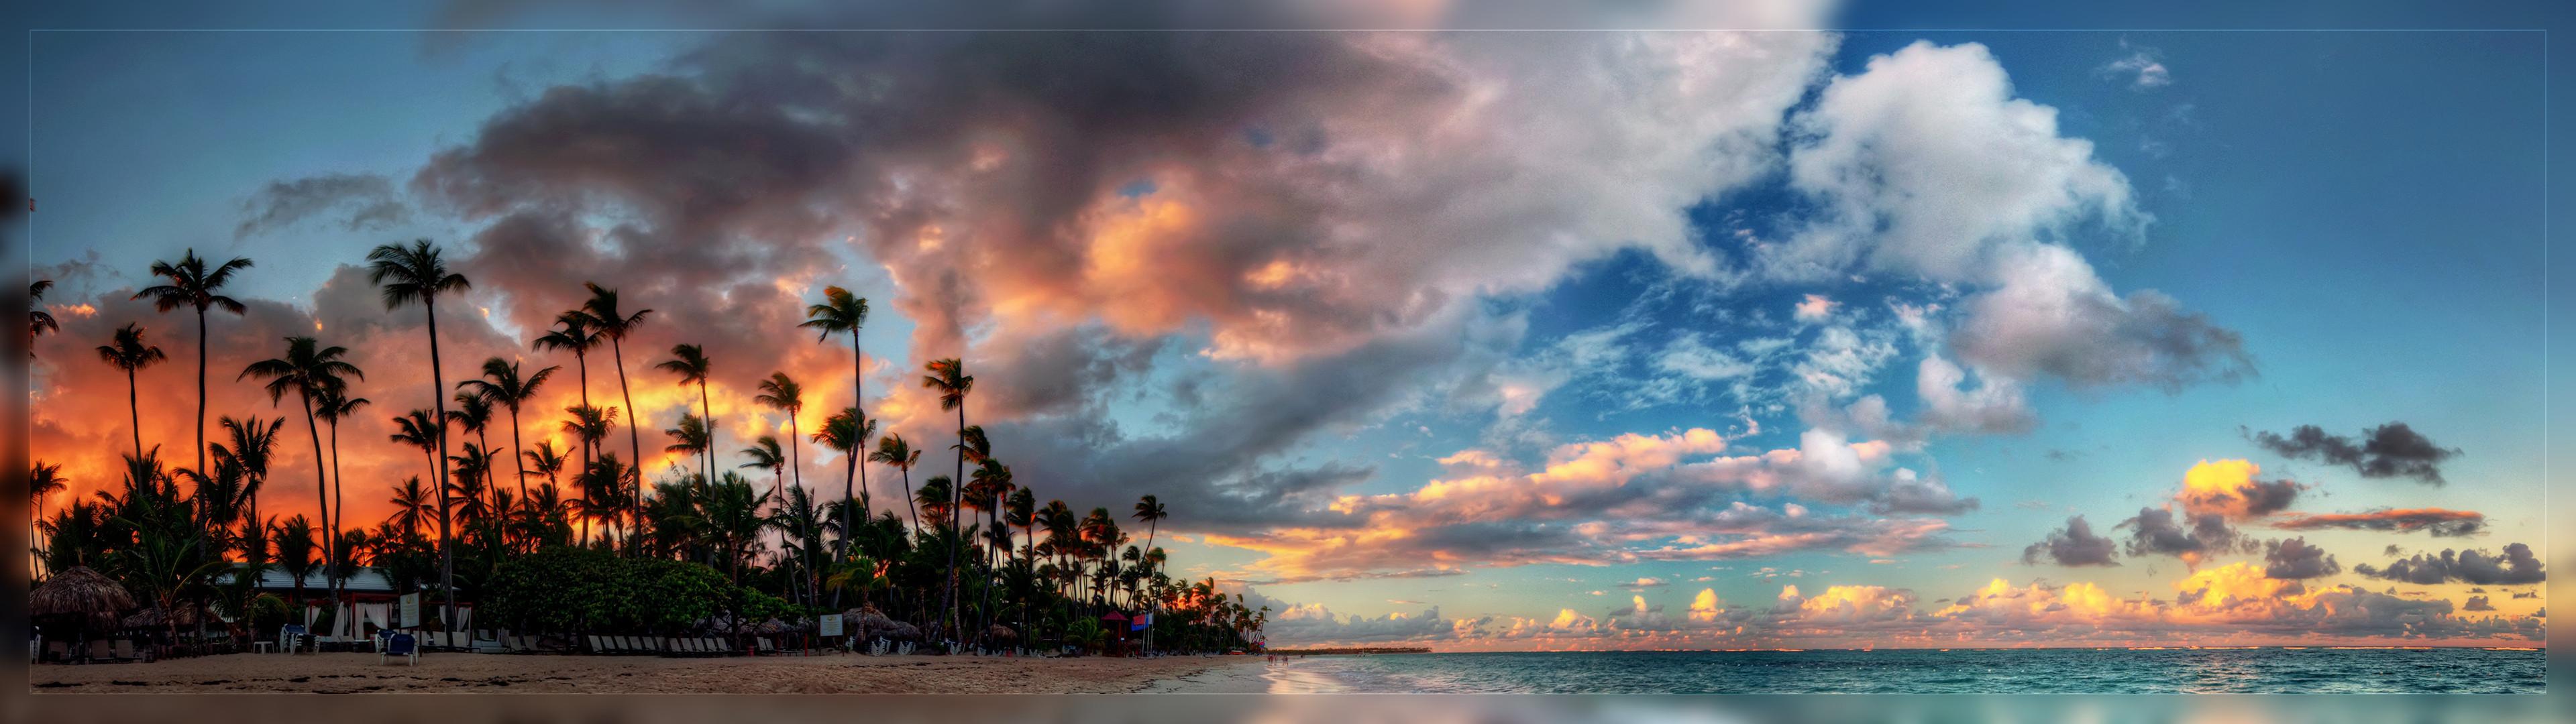 dual screen wallpaper 3840x1080 beach - photo #11